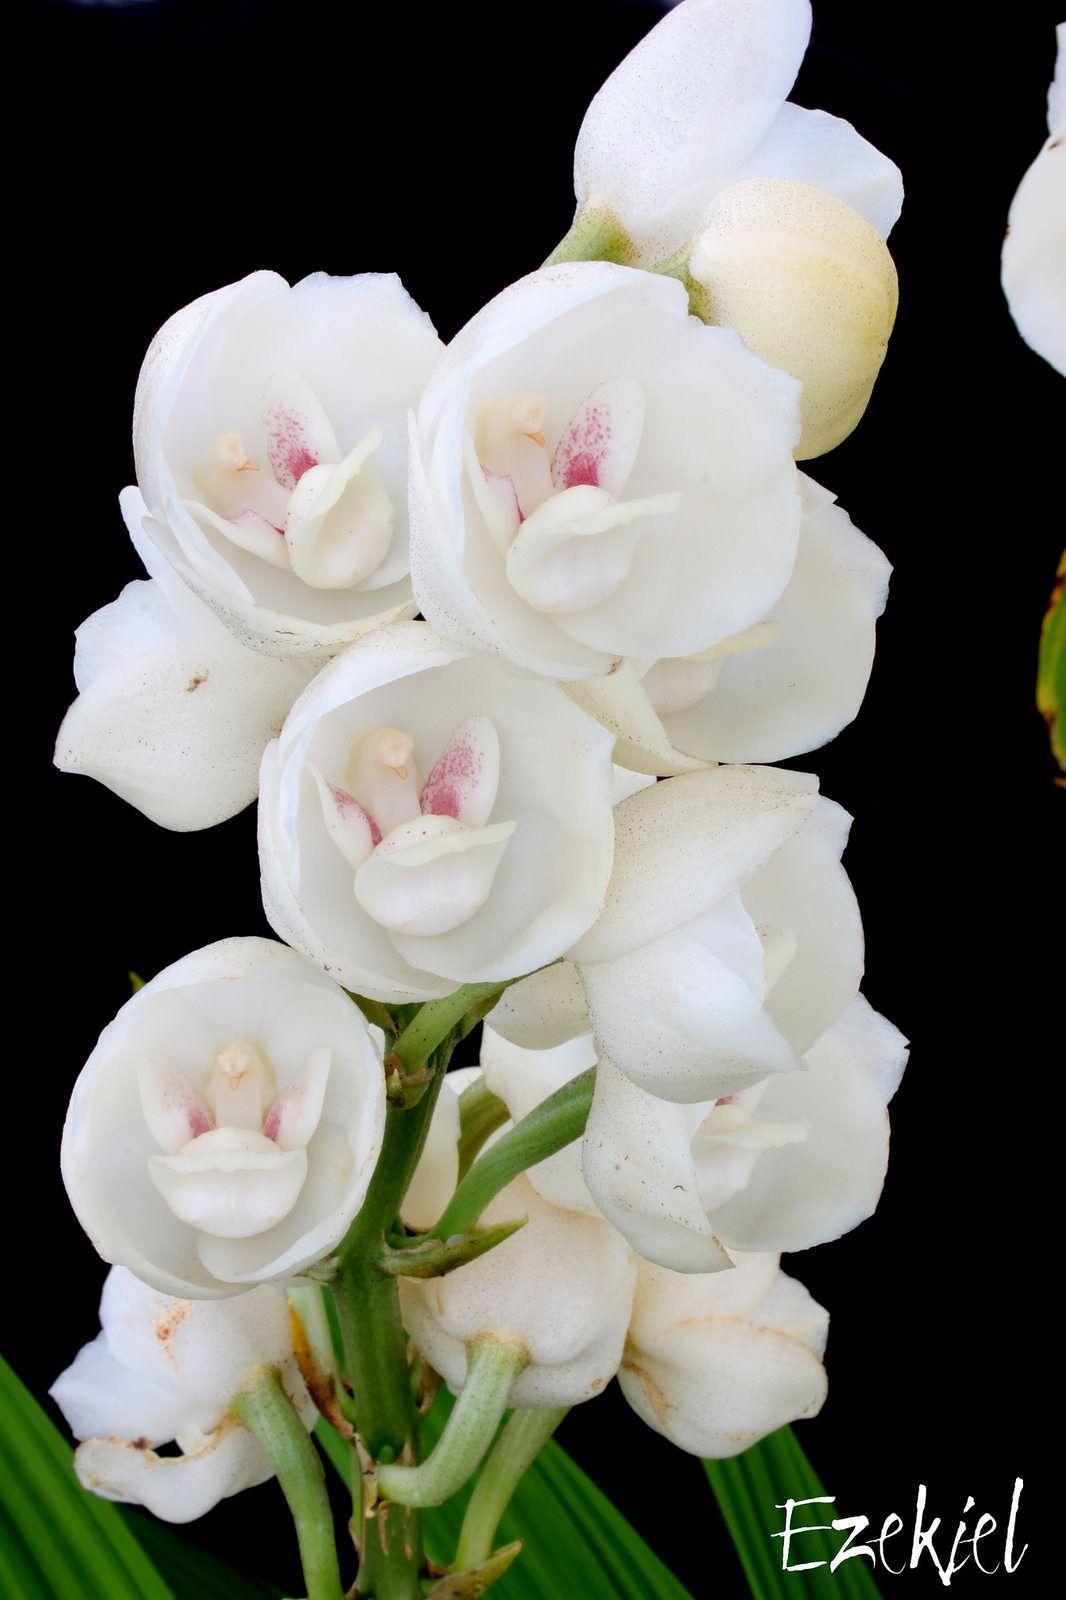 Resultado De Imagen Para Peristeria Elata Orchid Flower Orchids Flowers